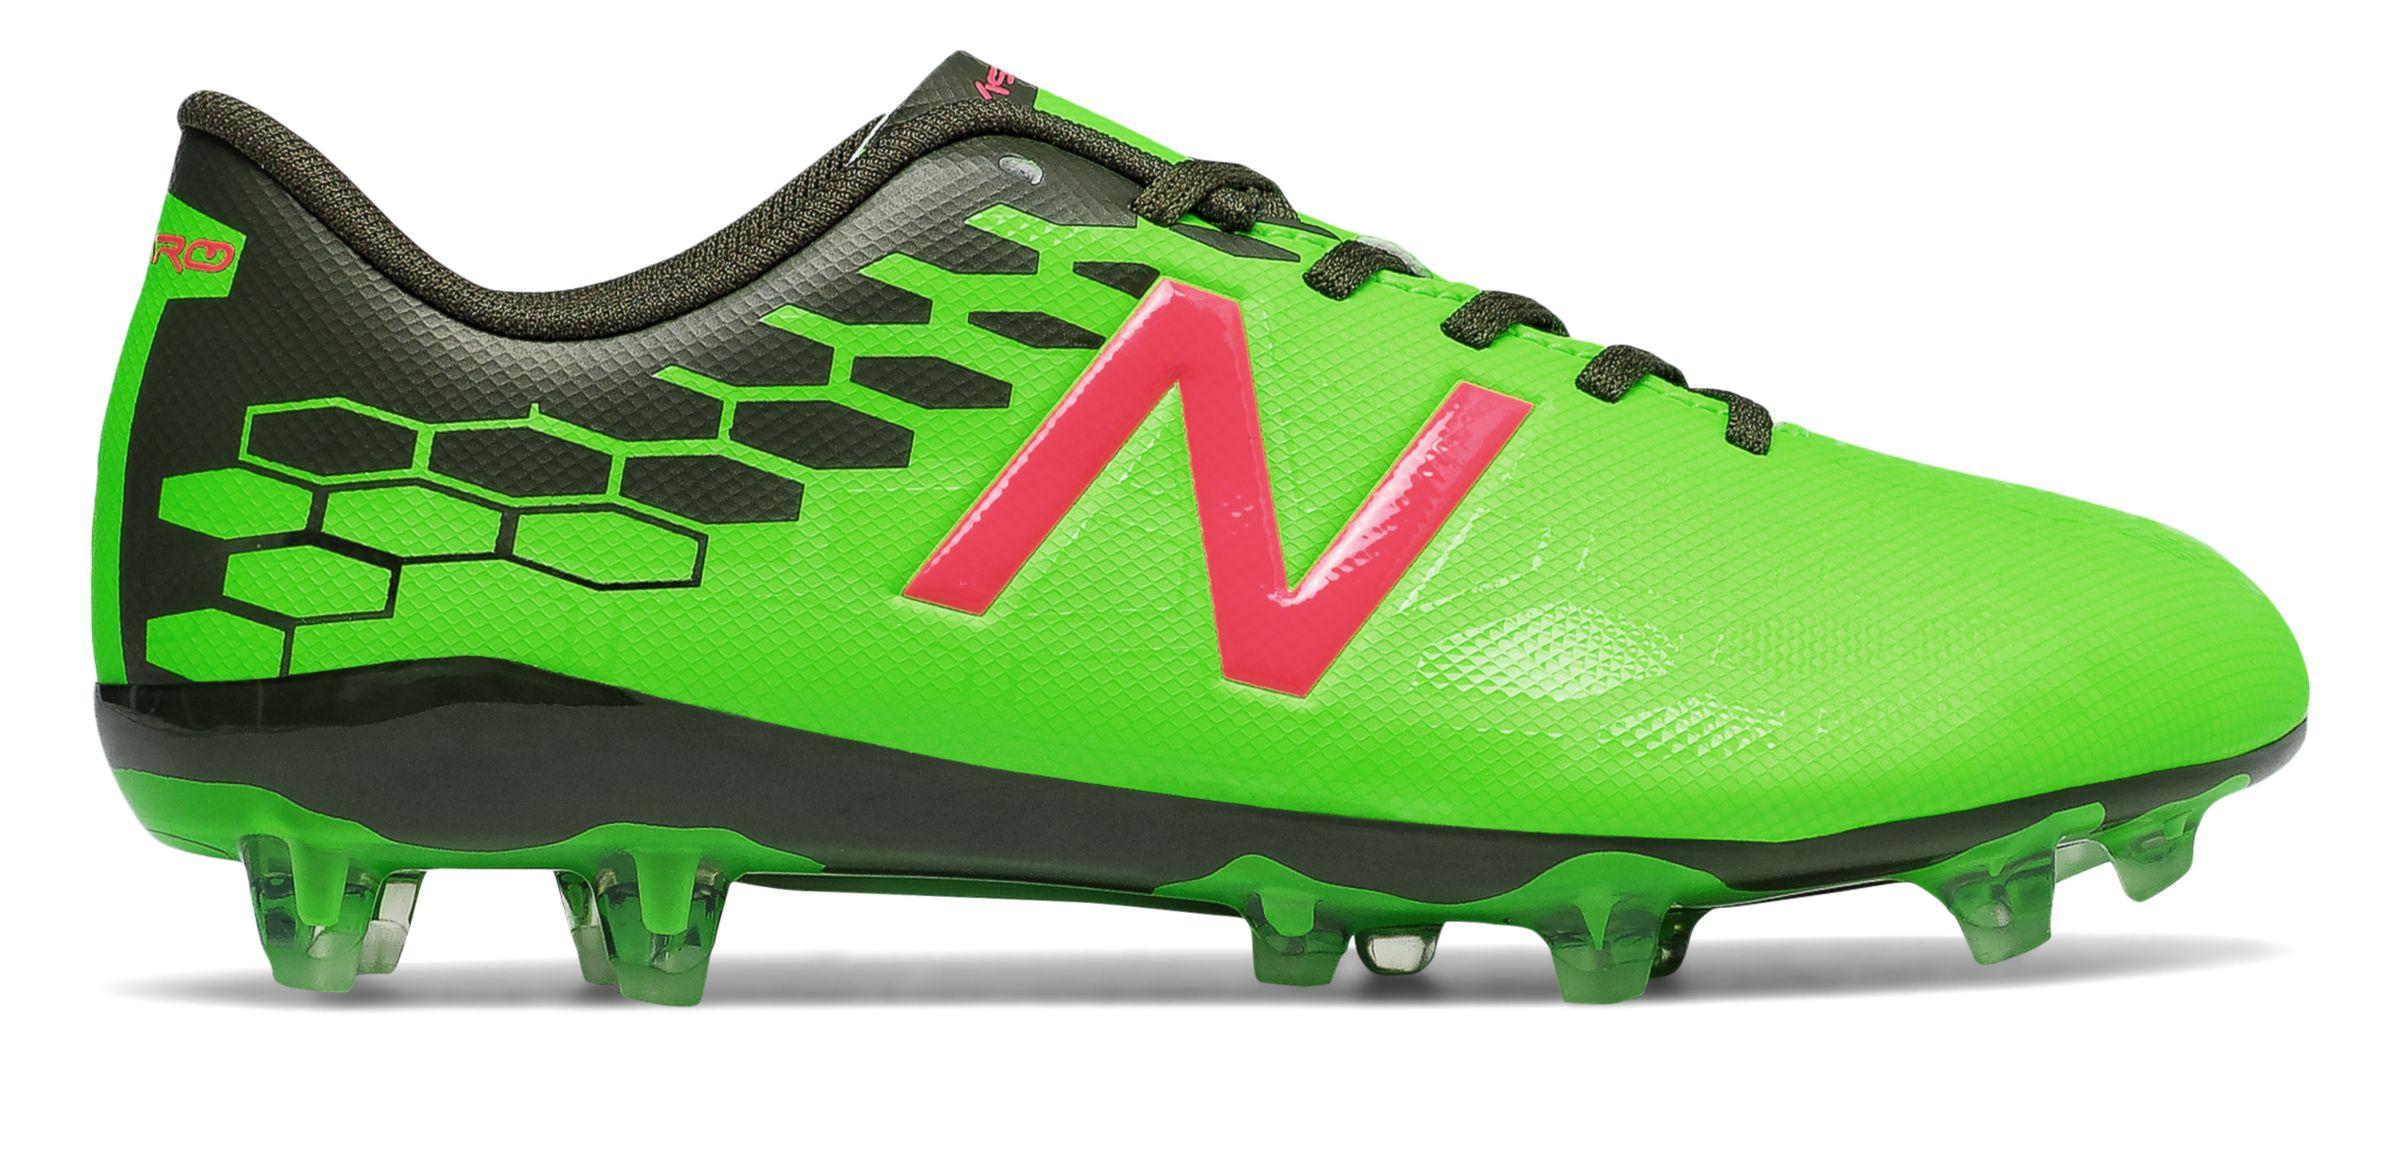 NB Junior Visaro 2.0 Control FG, Energy Lime with Military Dark Triumph & Alpha Pink